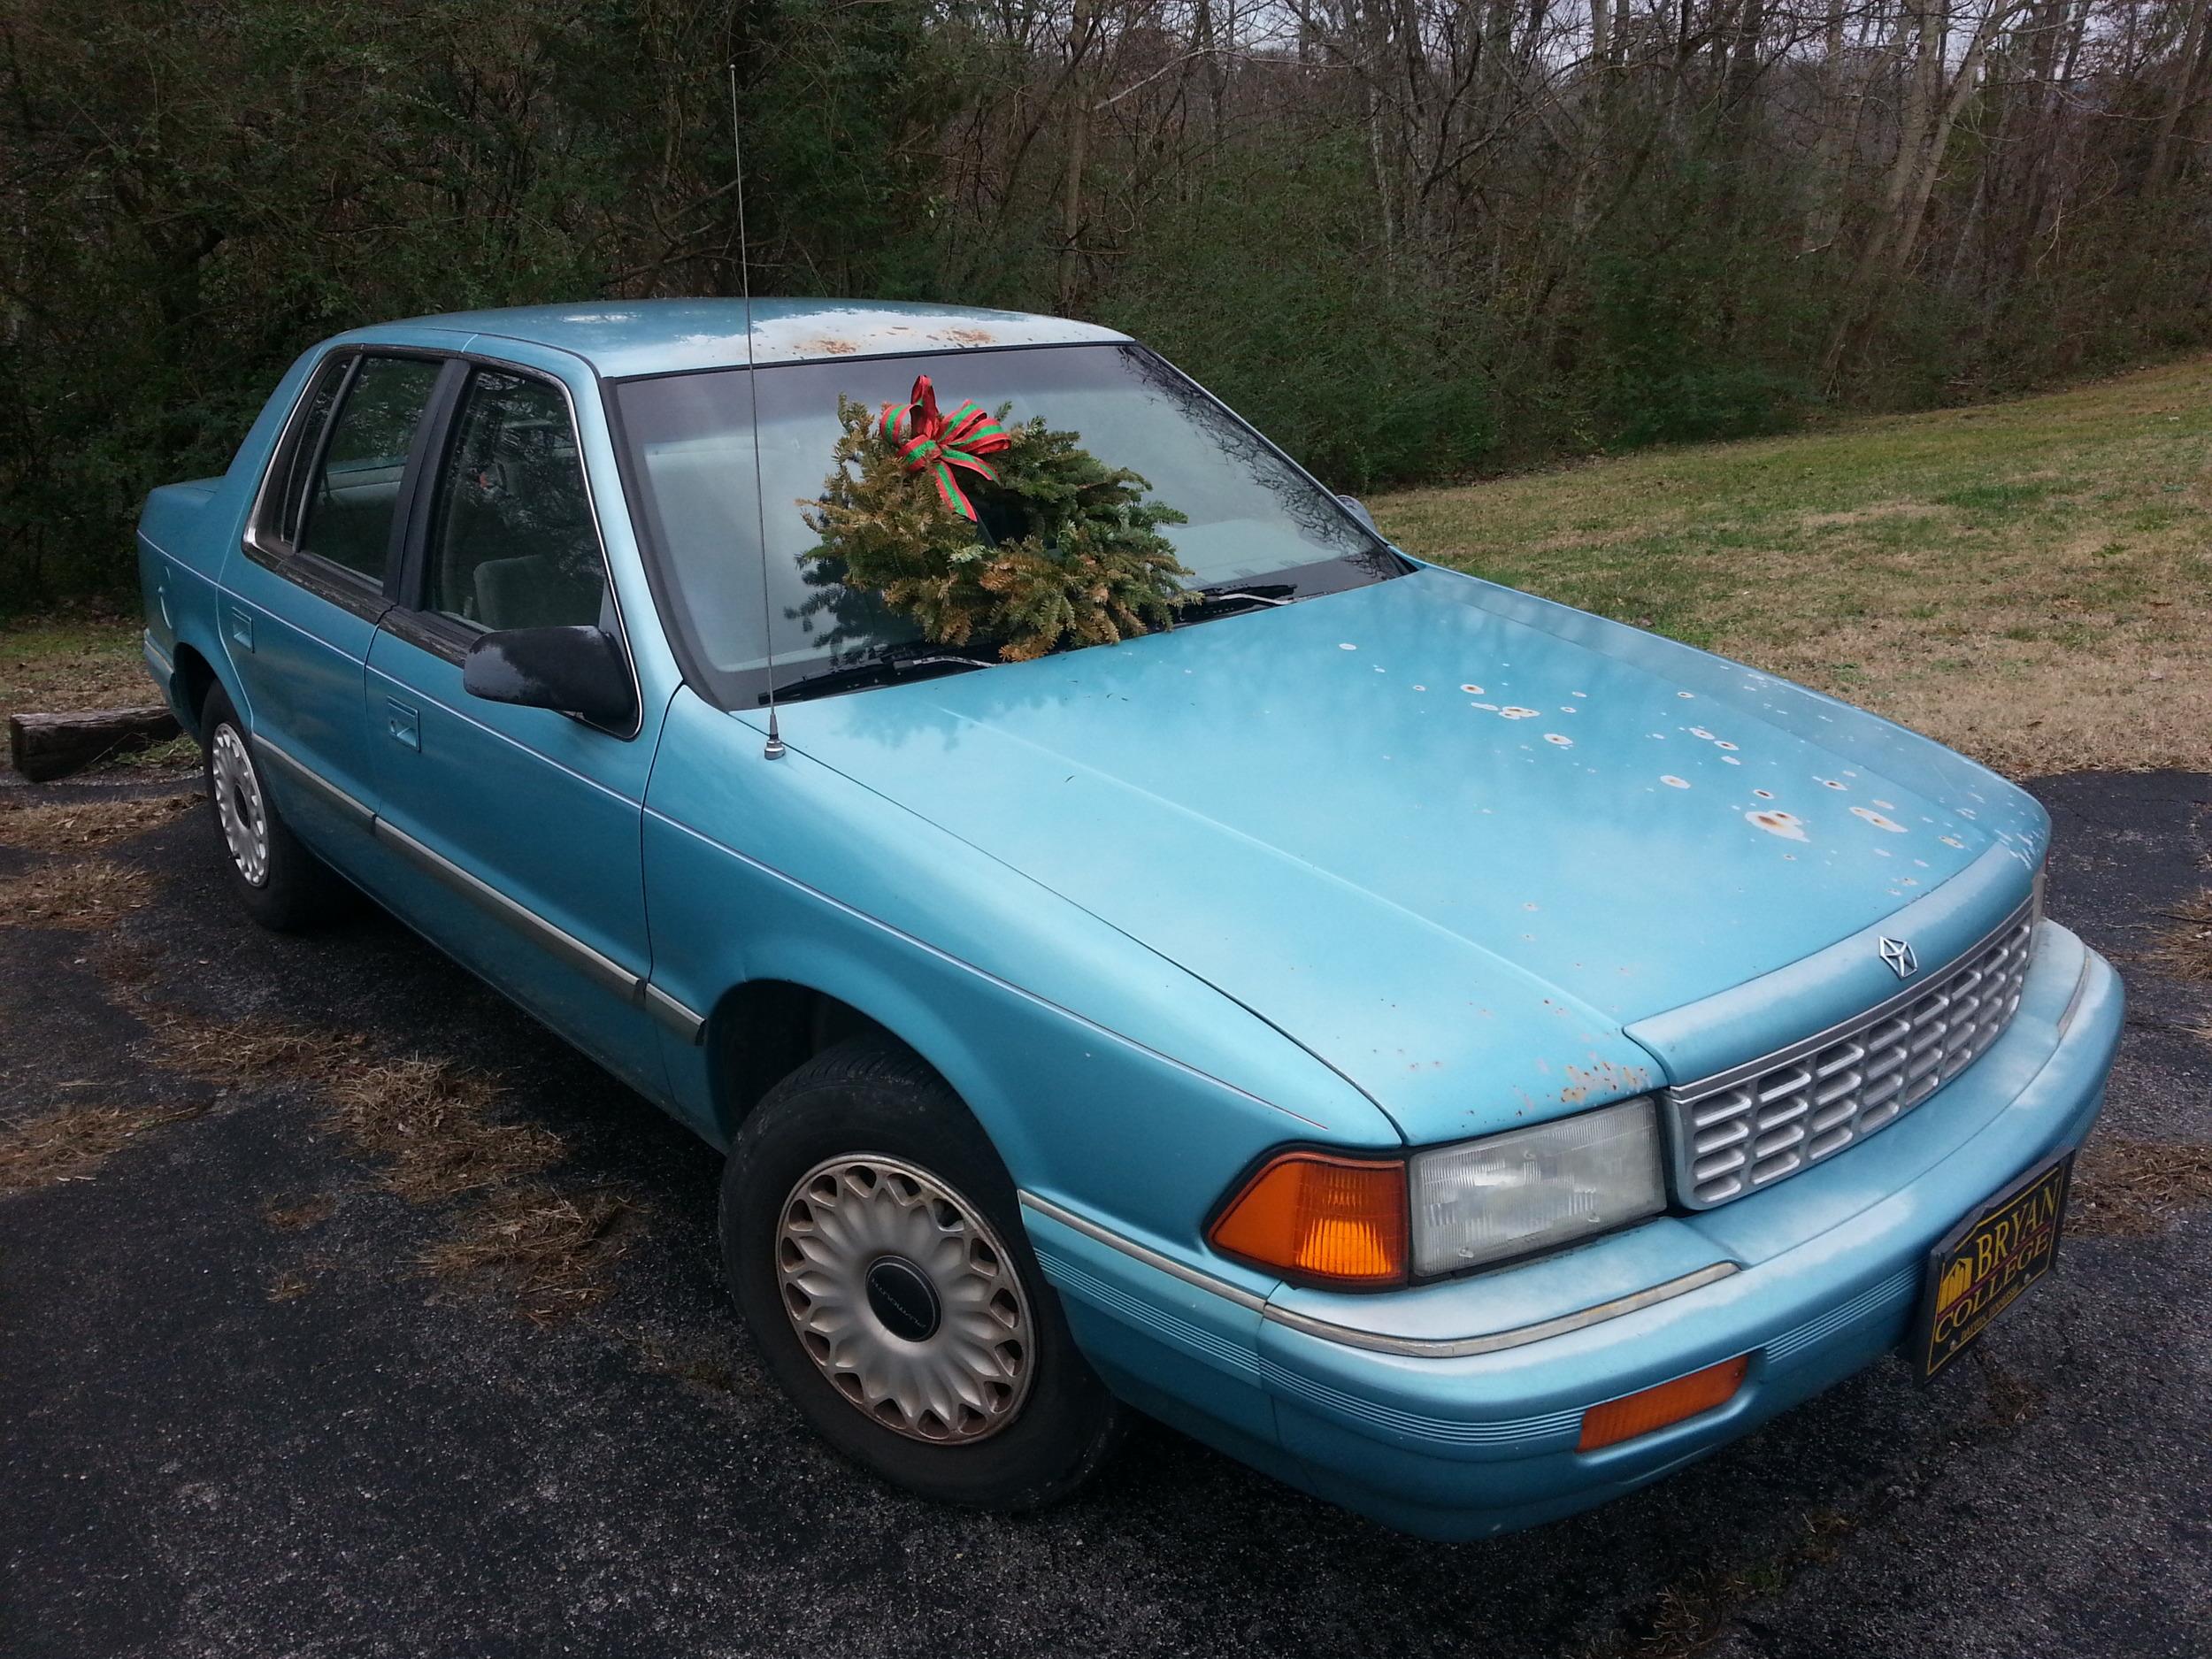 Wreath compliments of our neighbor, John.